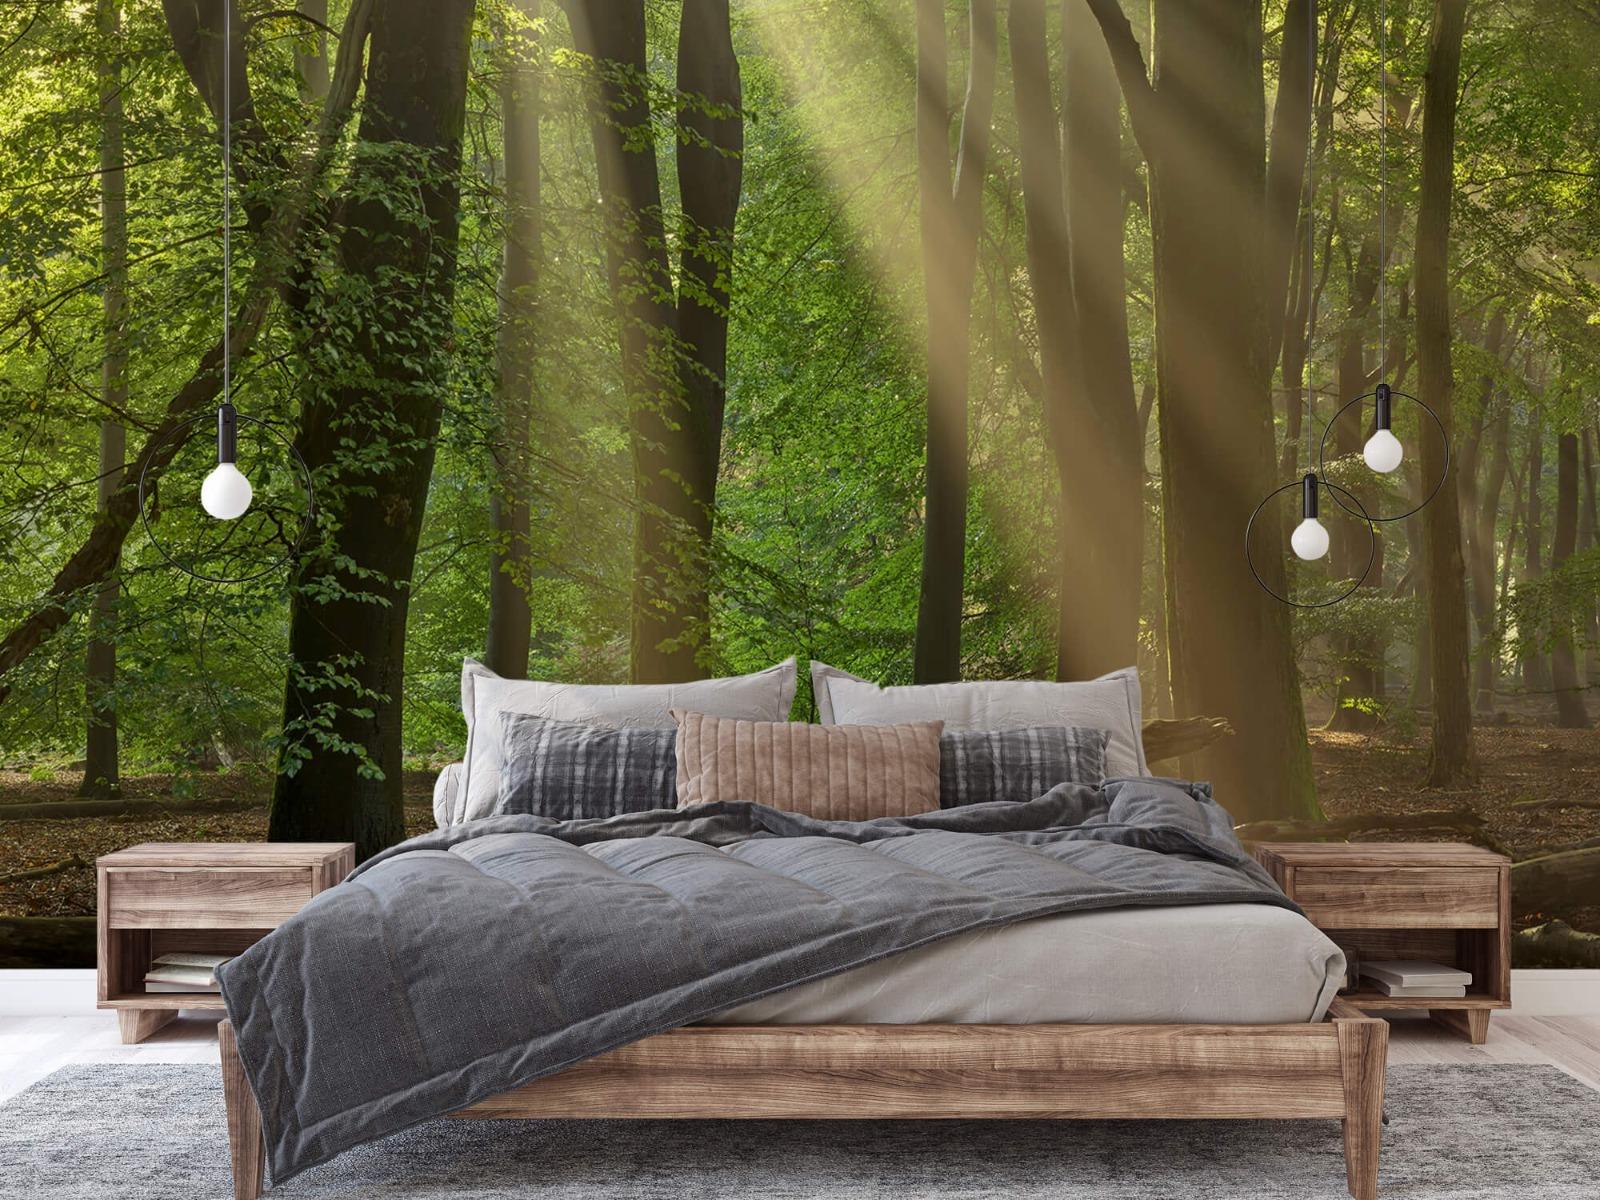 Bomen - Zonneharpen in het bos - Slaapkamer 6